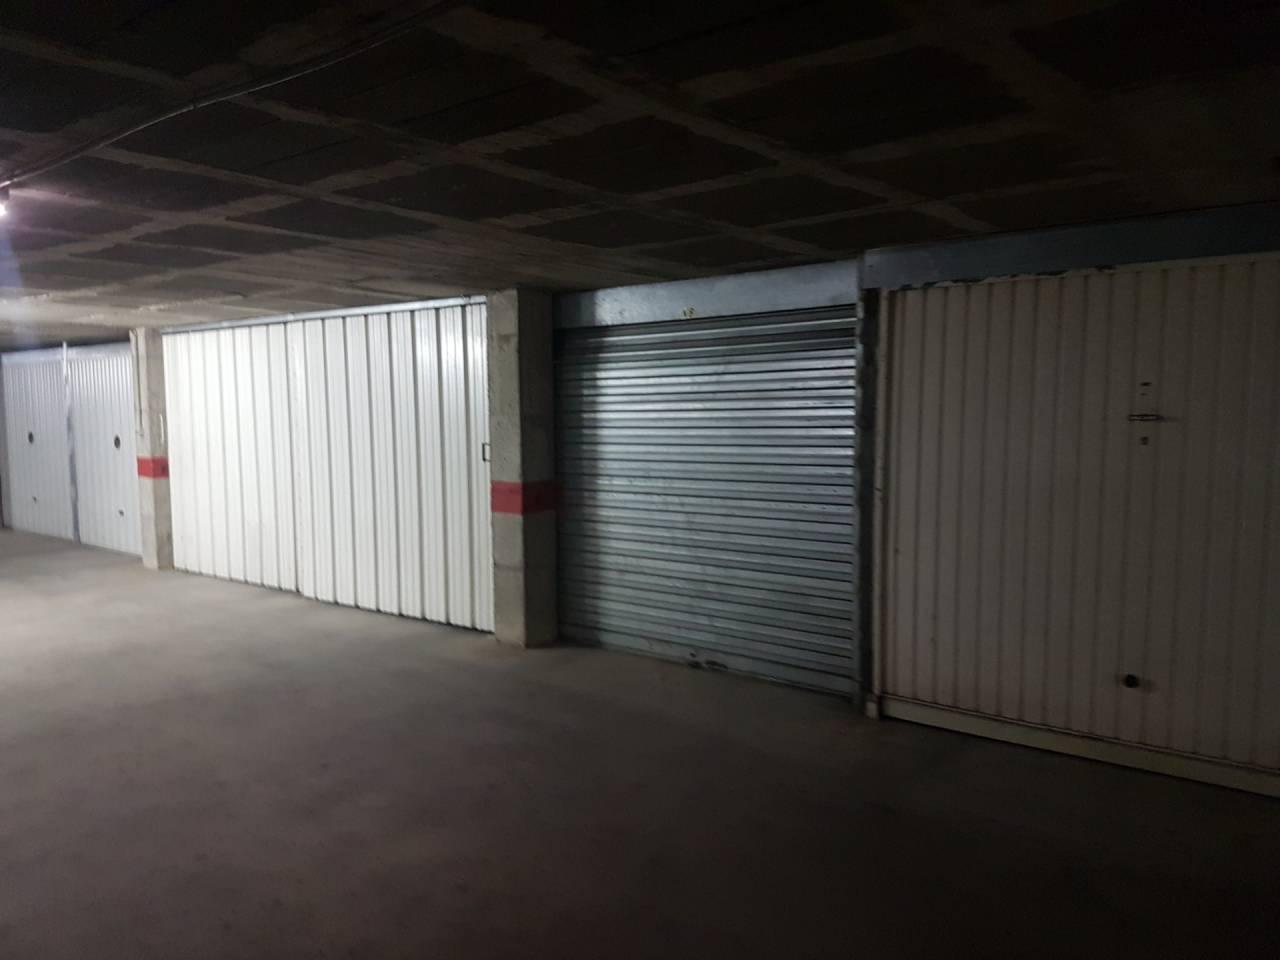 001186 - DELTA-MUGA Garage spaces for sale in Empuriabrava